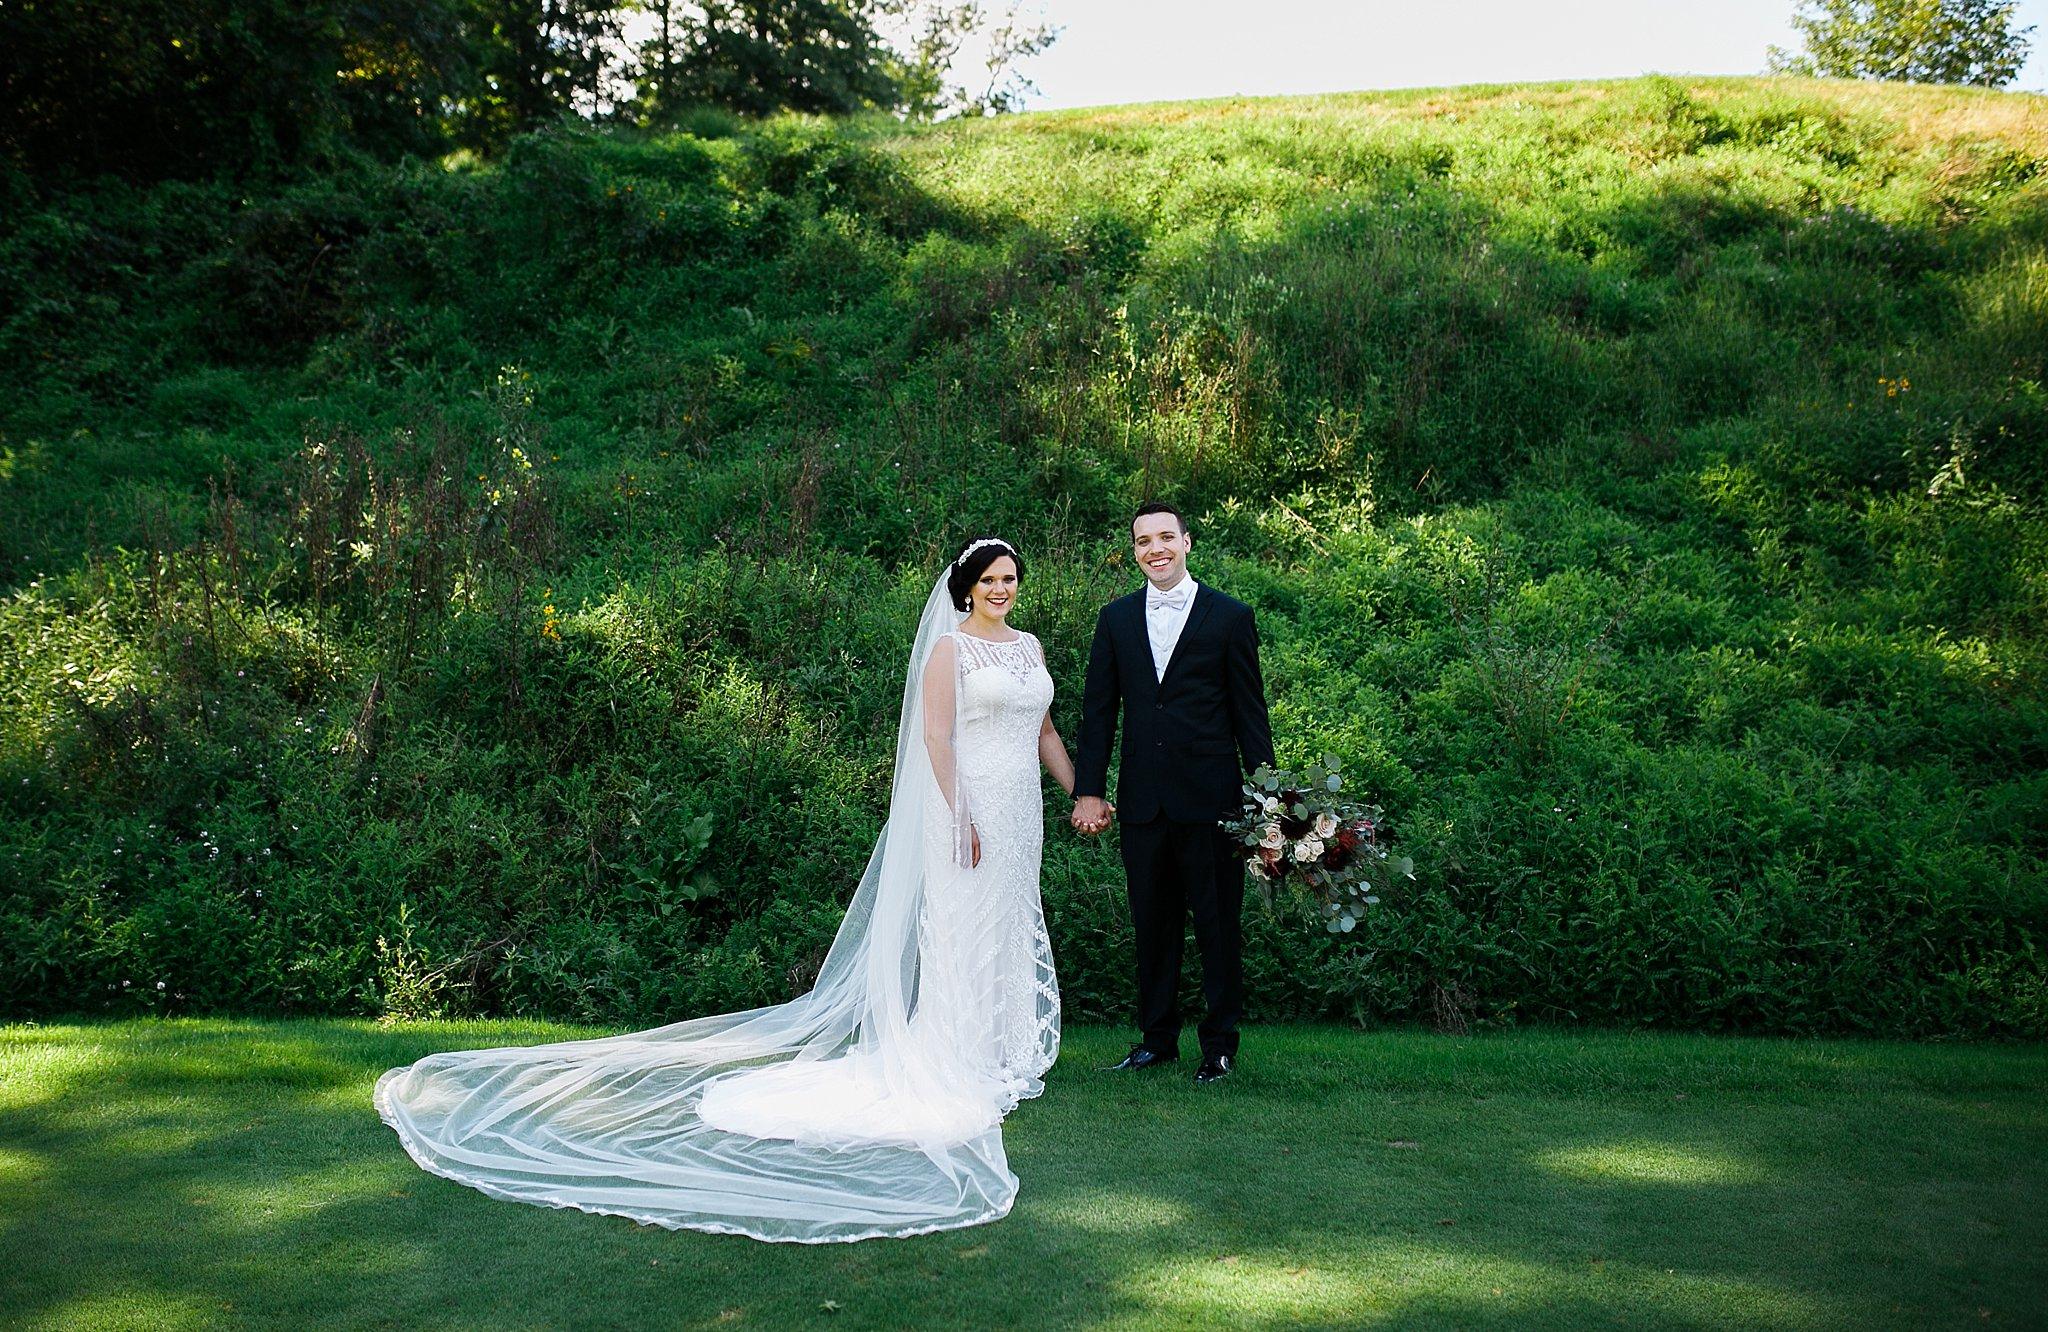 West Hills Country Club Wedding Gatsby Wedding Roaring Twenties Wedding Hudson Valley Wedding Photographer Sweet Alice Photography24.jpg